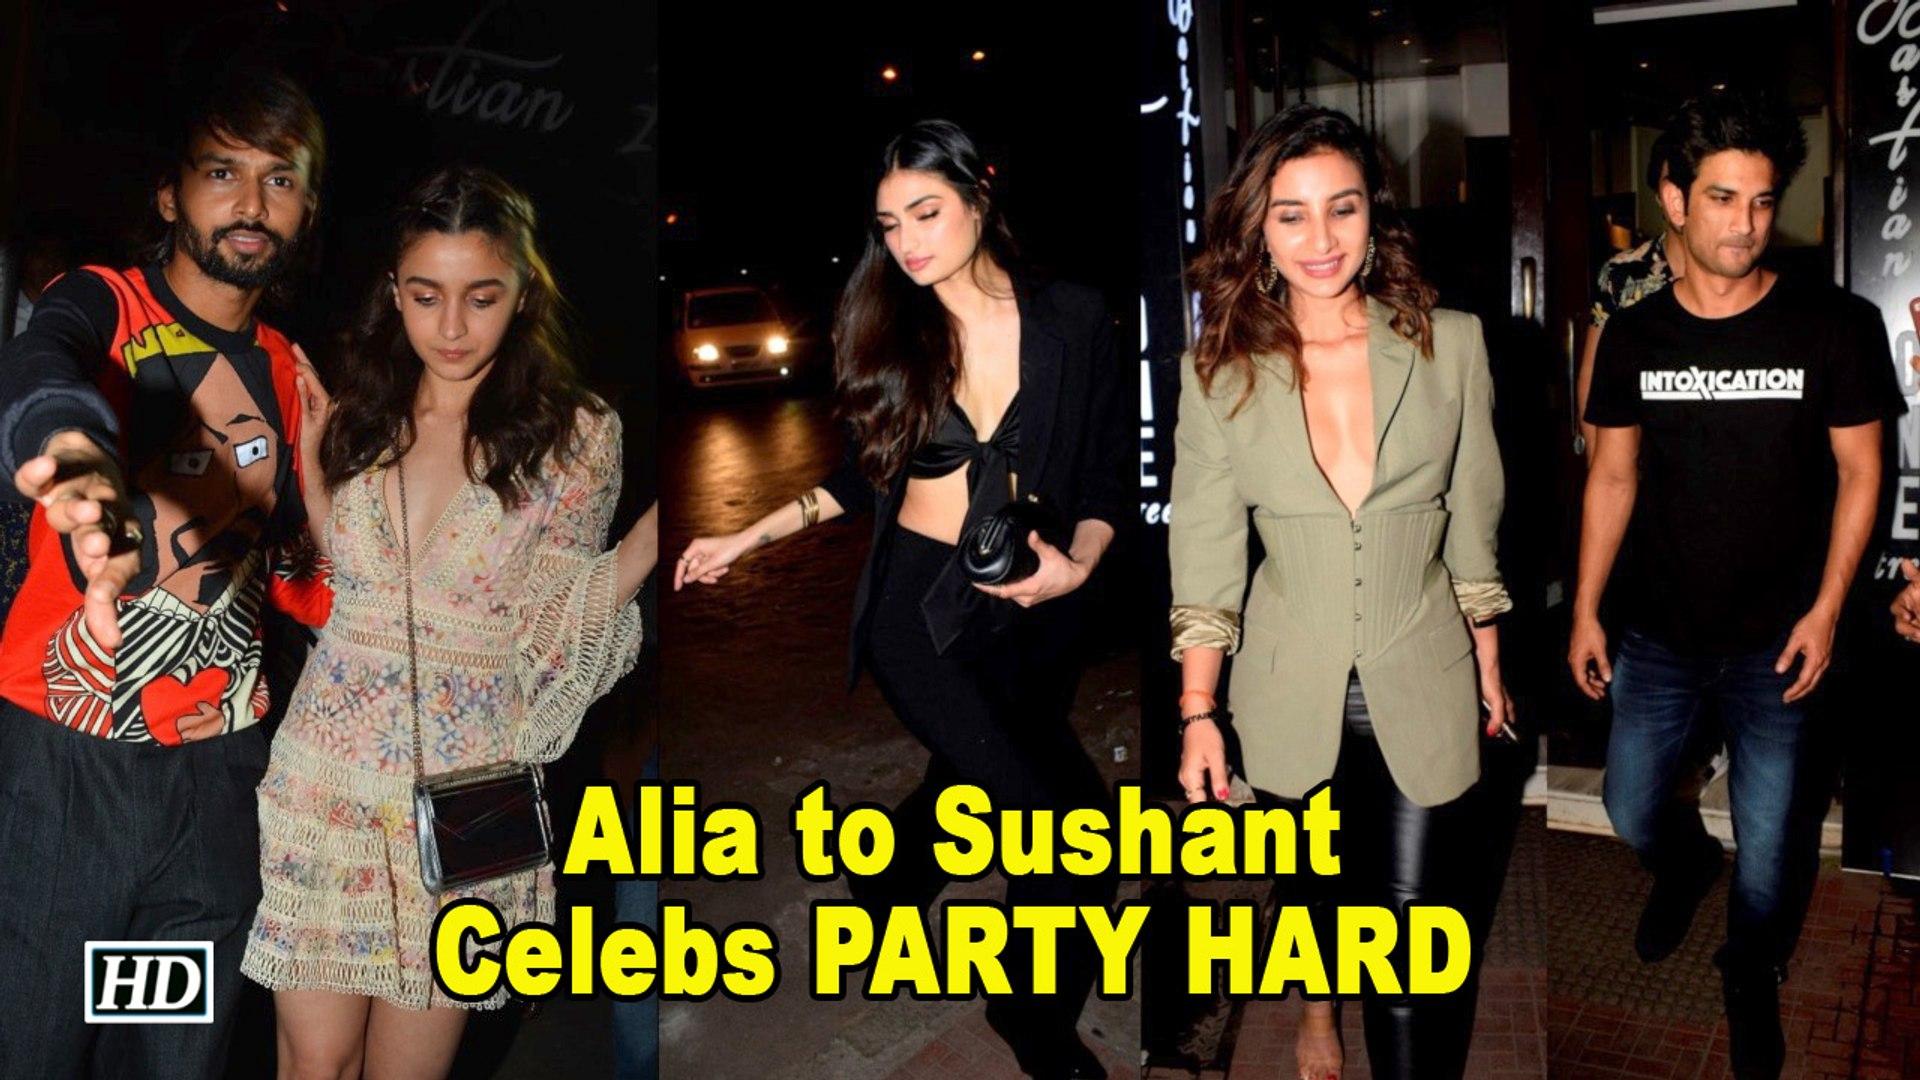 Alia, Sushant, Patralekha PARTY HARD at Akansha Ranjan's B'day